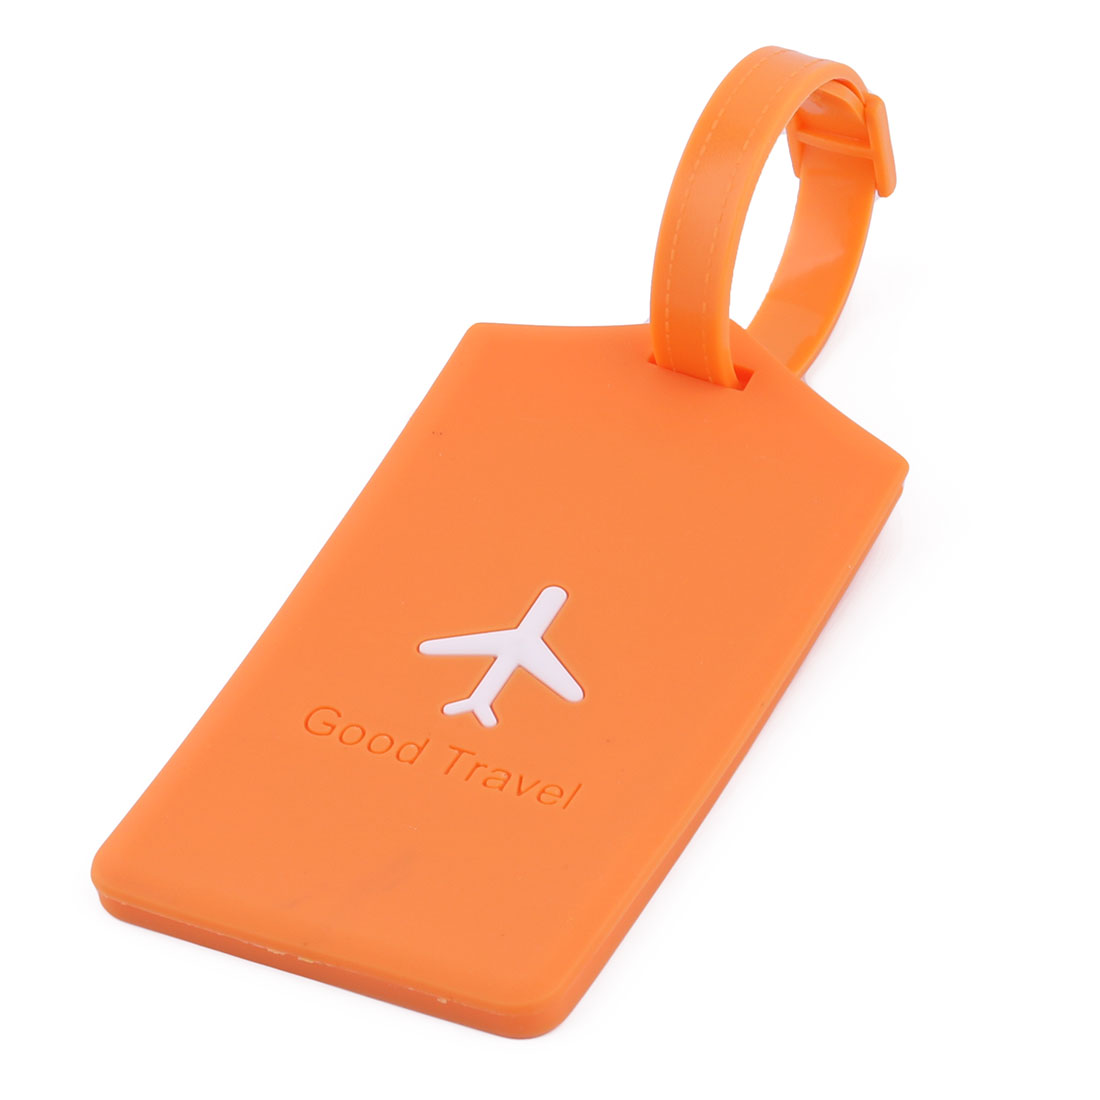 Silicone Rectangle Airplane Travel Suitcase Label Luggage Tag Name Address Card Holder Orange